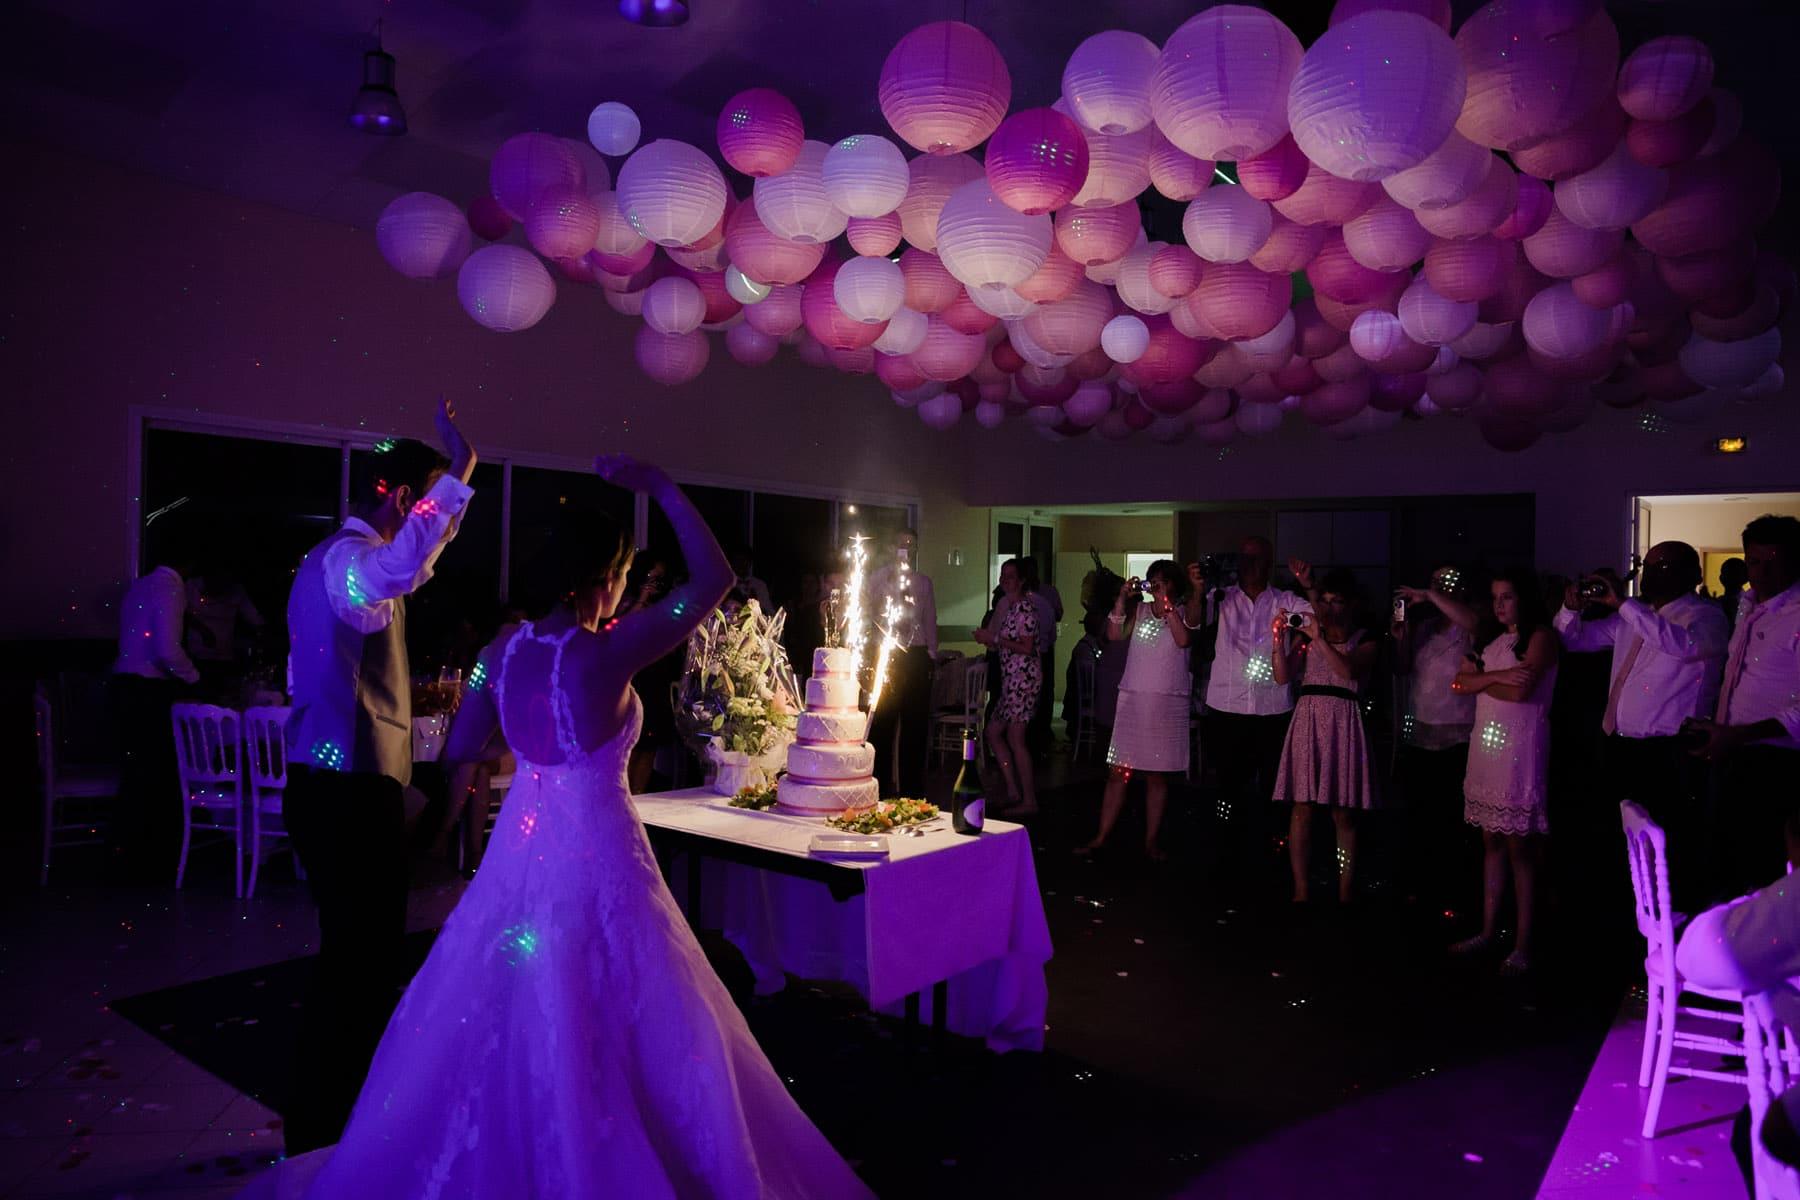 photographe mariage bordeaux landes fineart francais sarah miramon blog 53